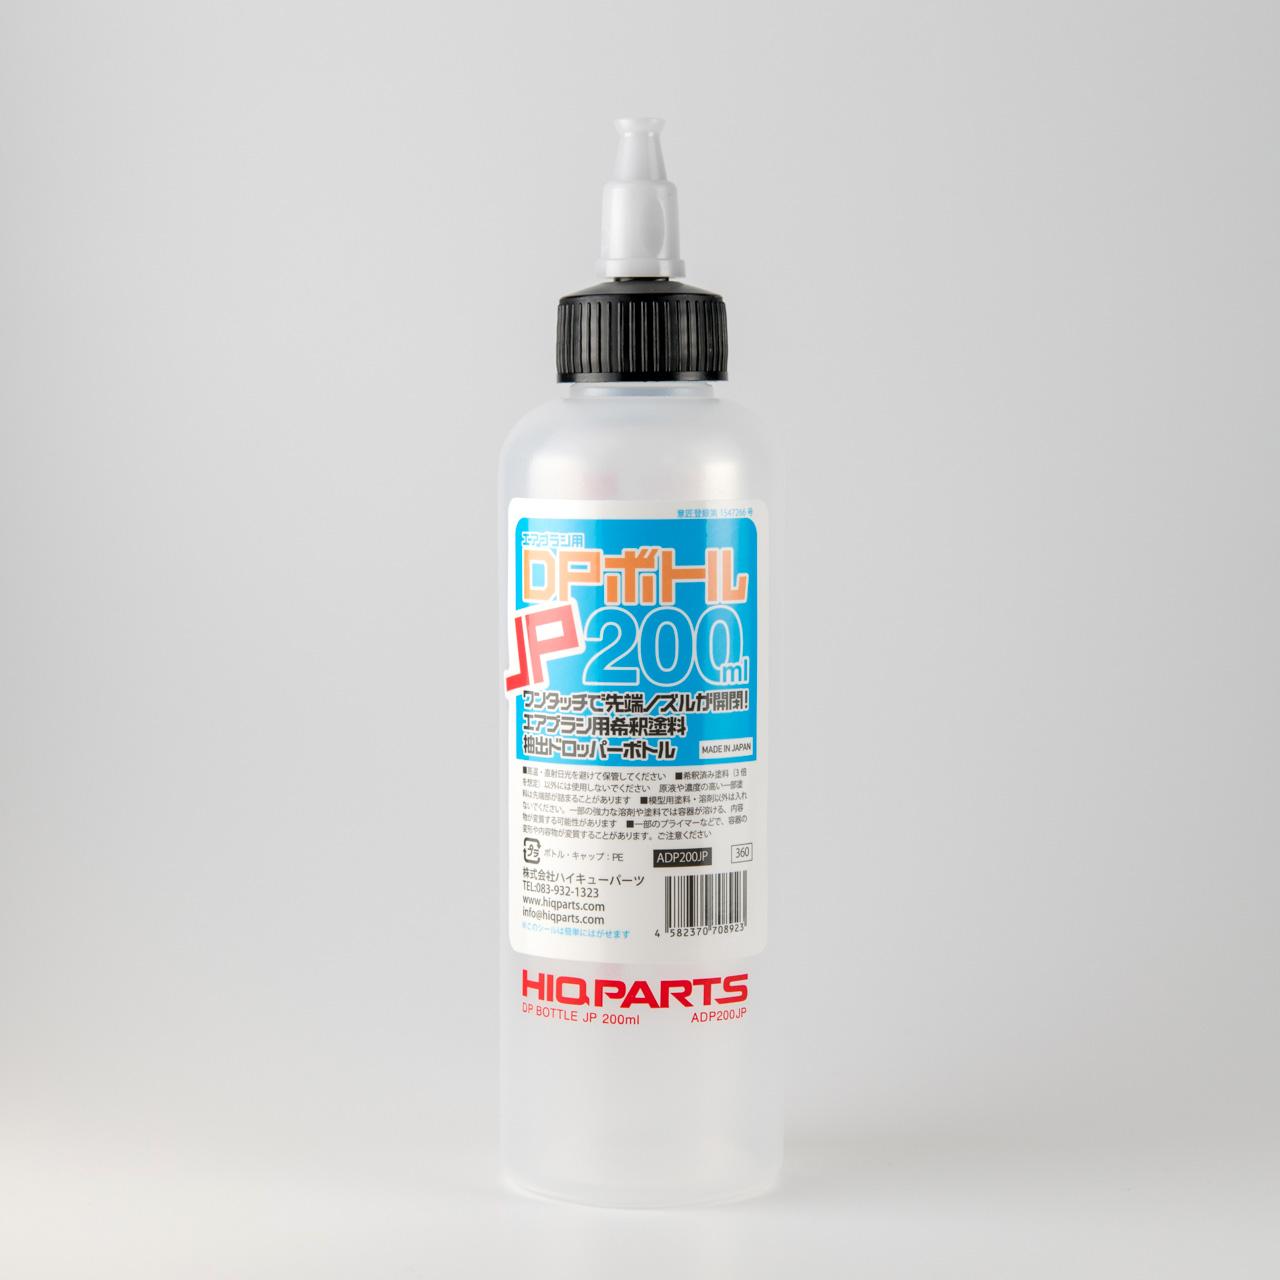 HIQPARTS(ハイキューパーツ) DPボトルJP 200ml(1個入) [ADP200JP]